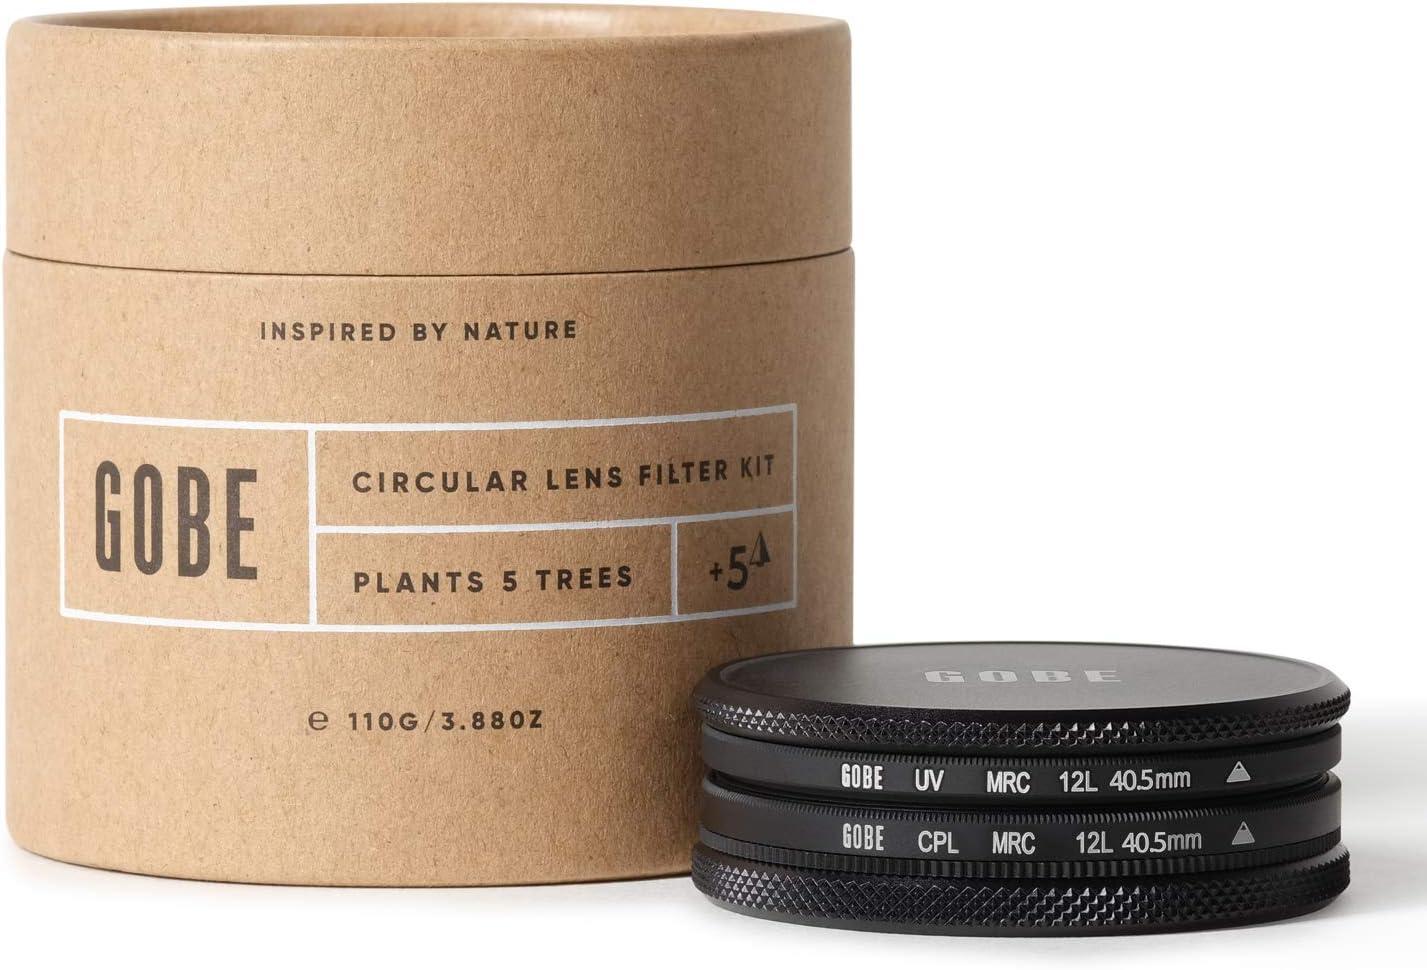 Gobe 40.5mm UV + Circular Polarizing (CPL) Lens Filter Kit (1Peak)